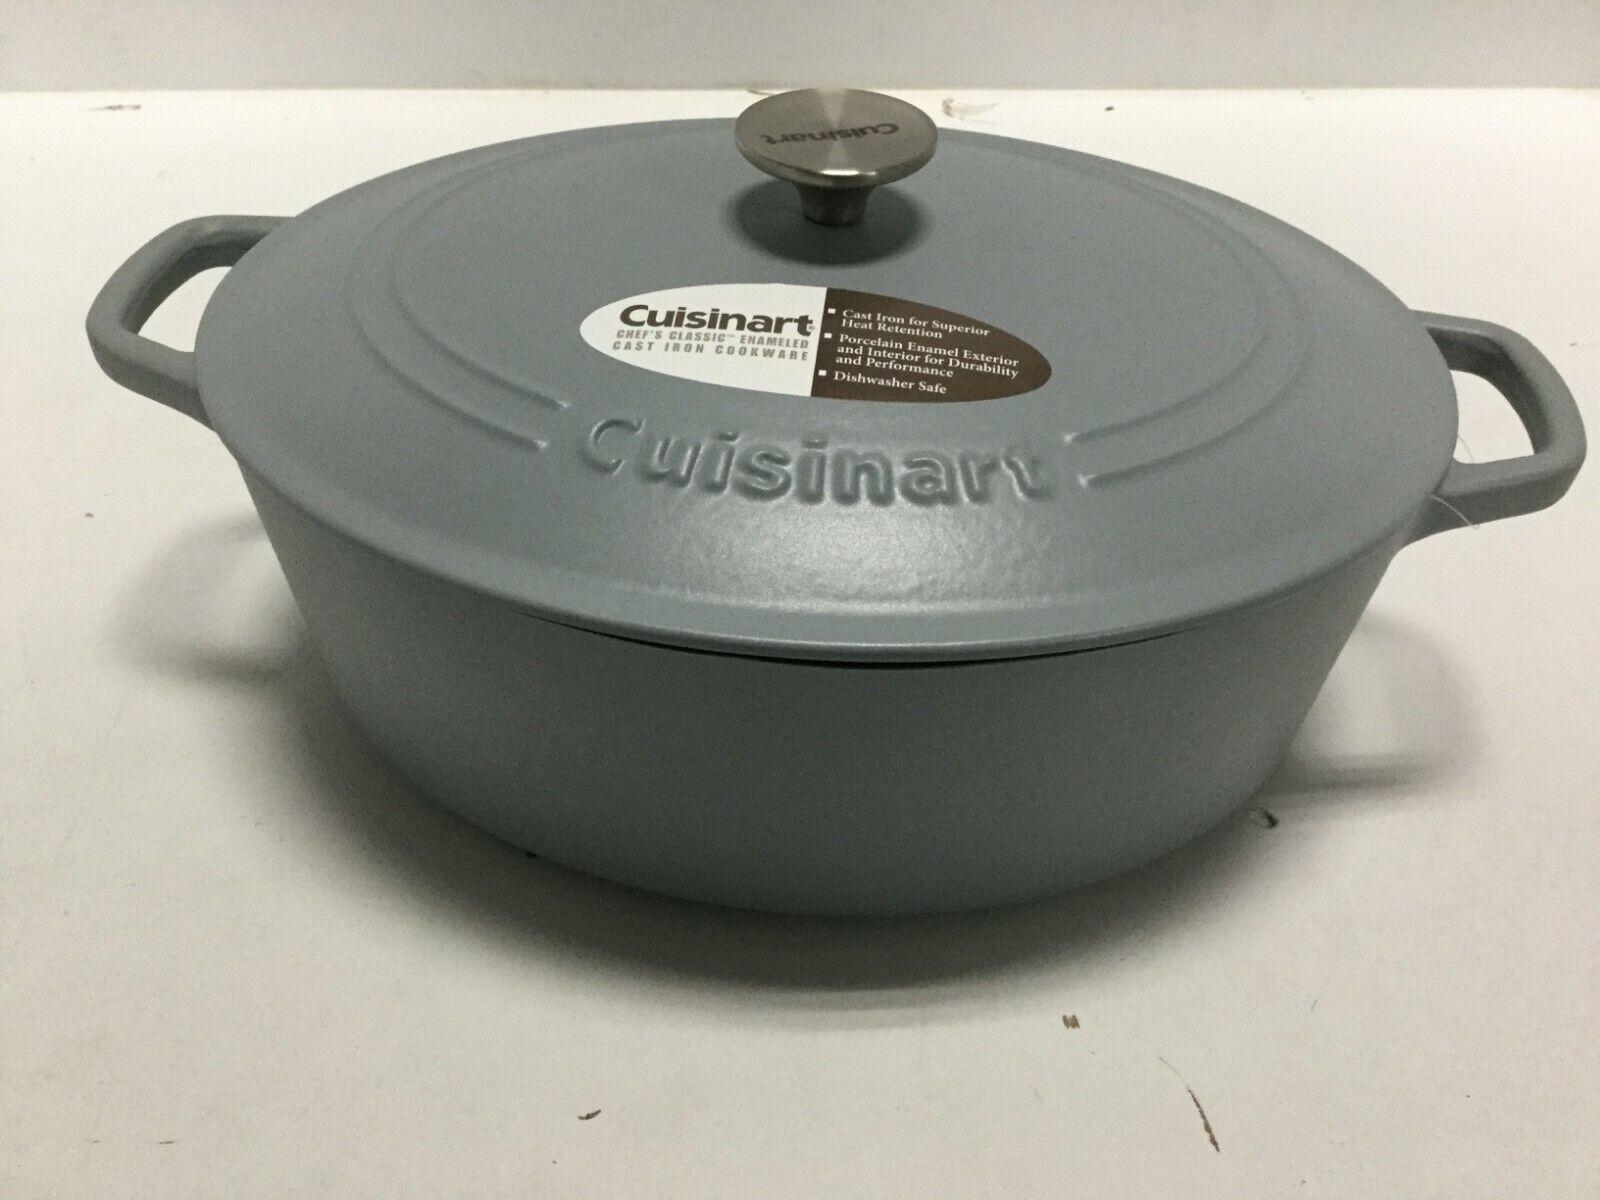 Cuisinart CI770-33GYM Oval 7 Qt. Cacerola Plato de utensilios de cocina de hierro fundido gris mate